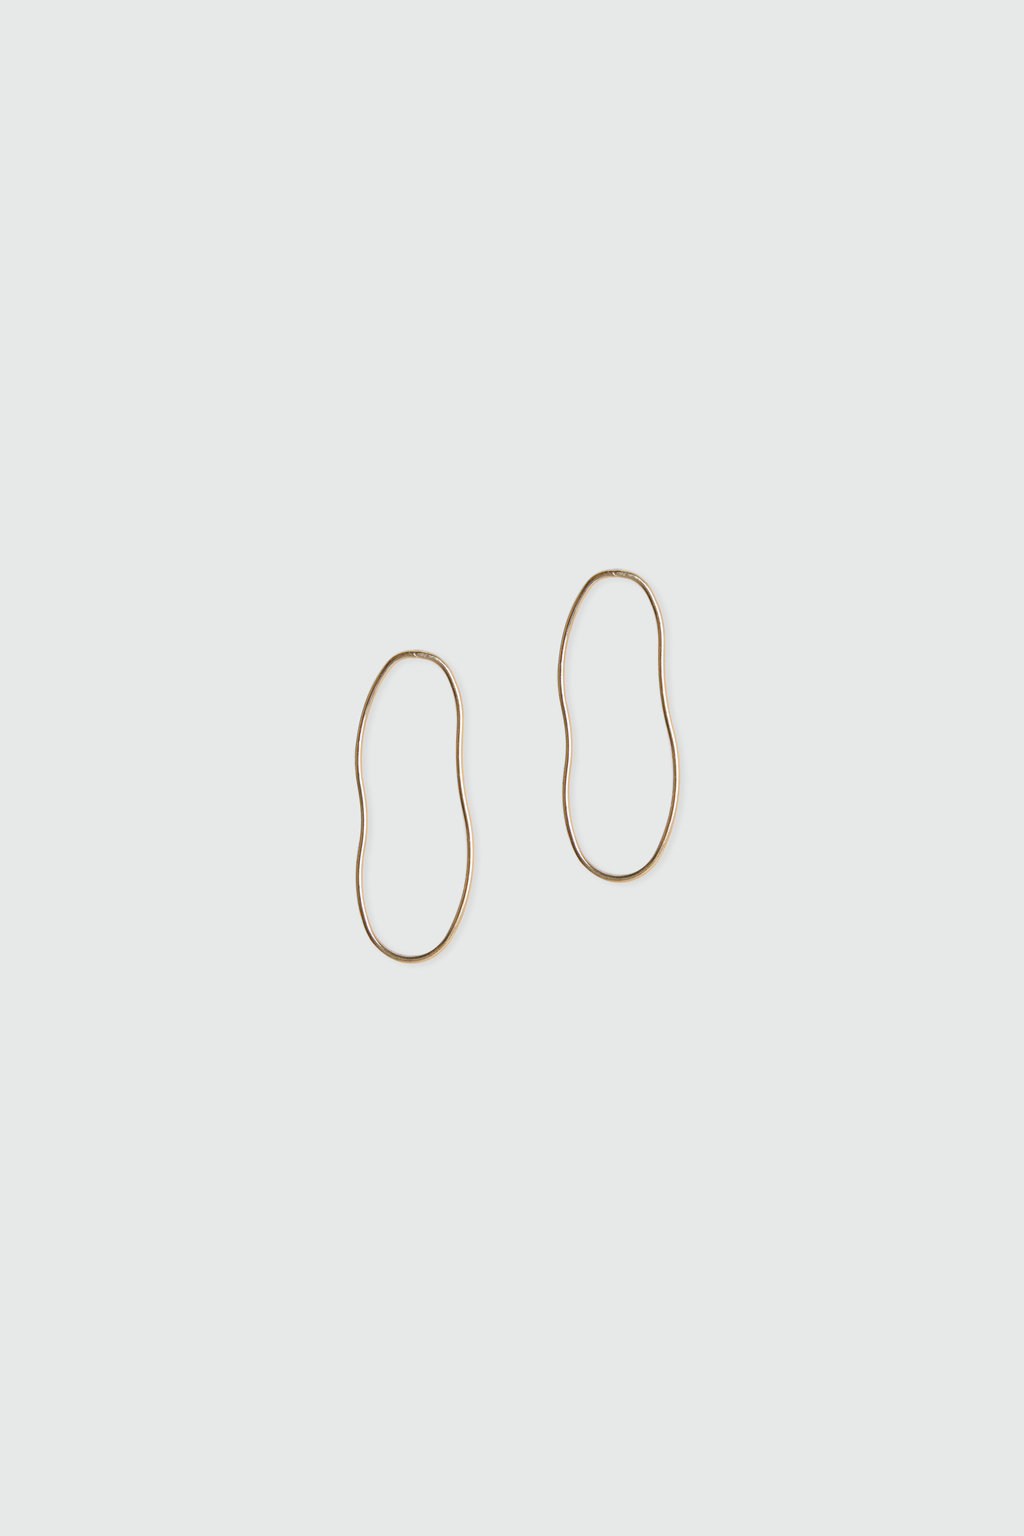 Earring 2341 Gold 2